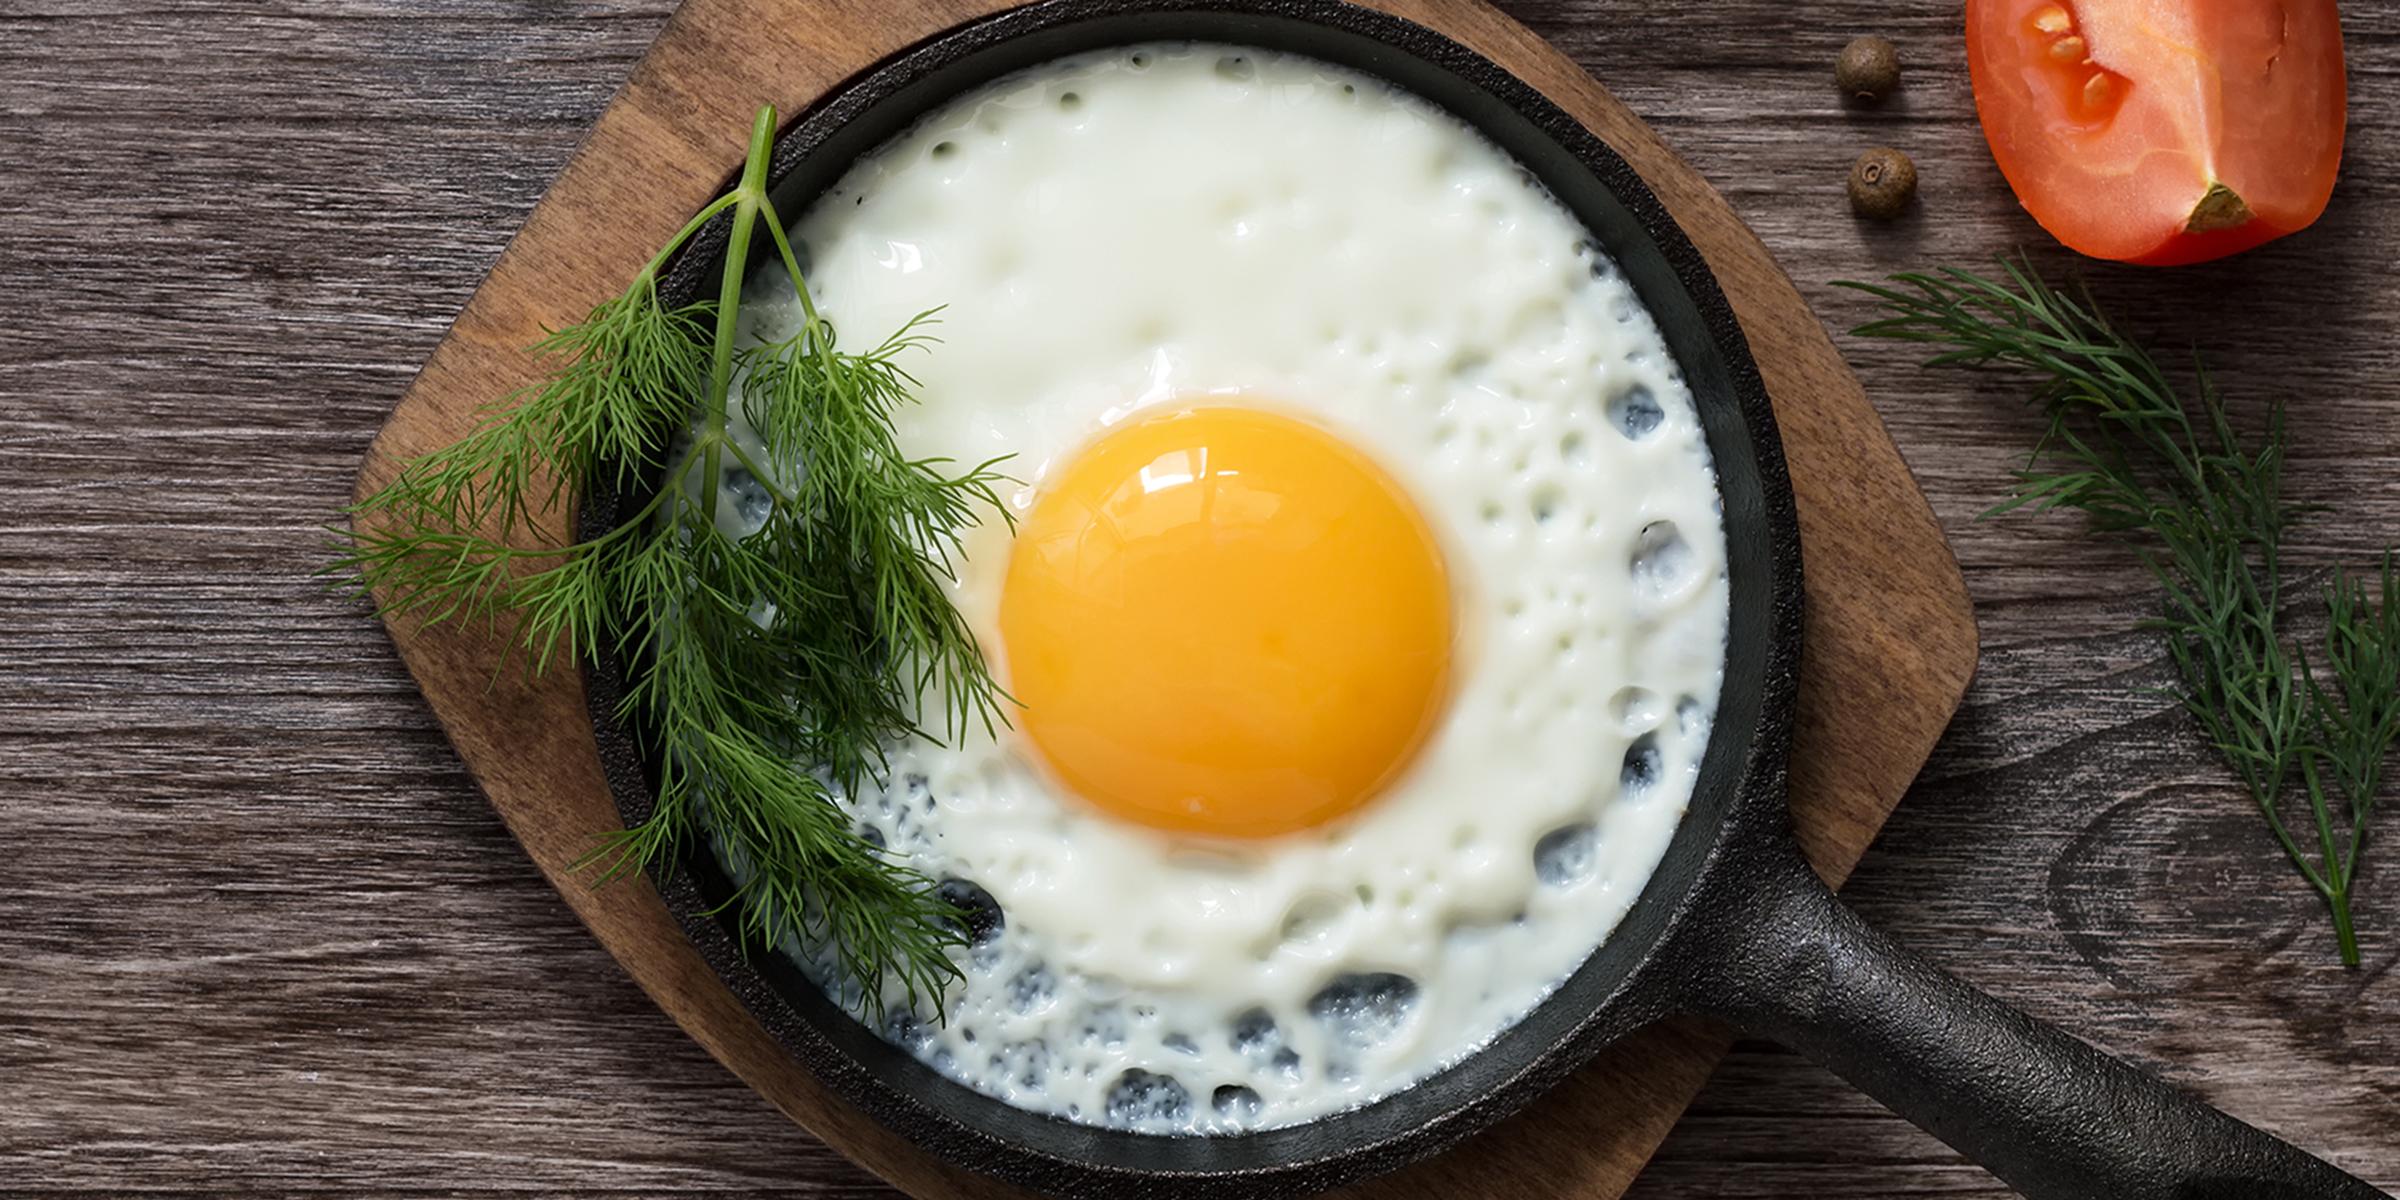 yumurta-kas-yapici